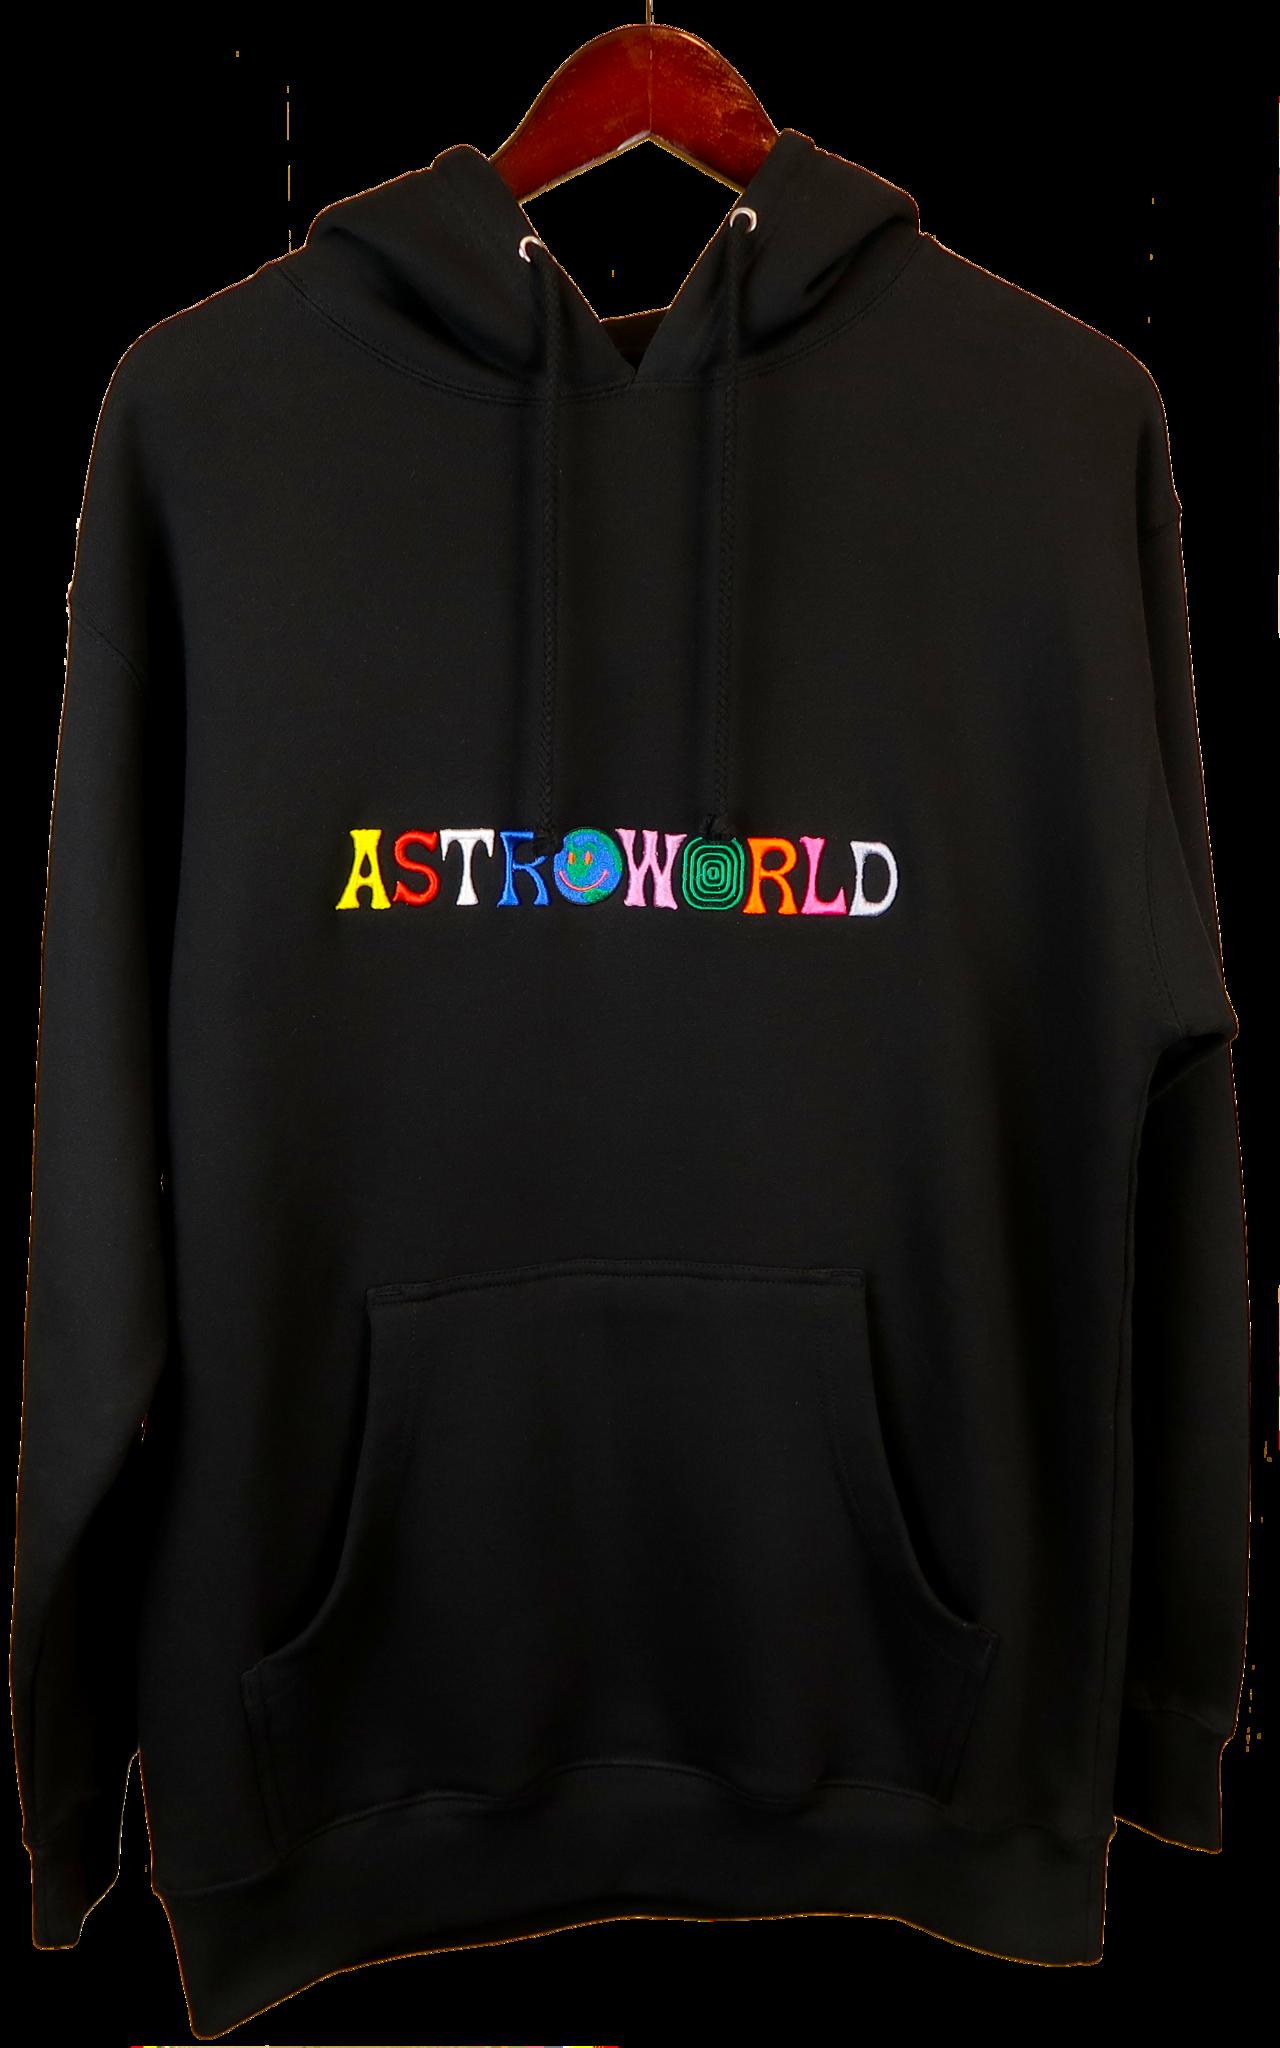 ac71e82e0ee5 Travis Scott Astroworld Hoodie   Grailed